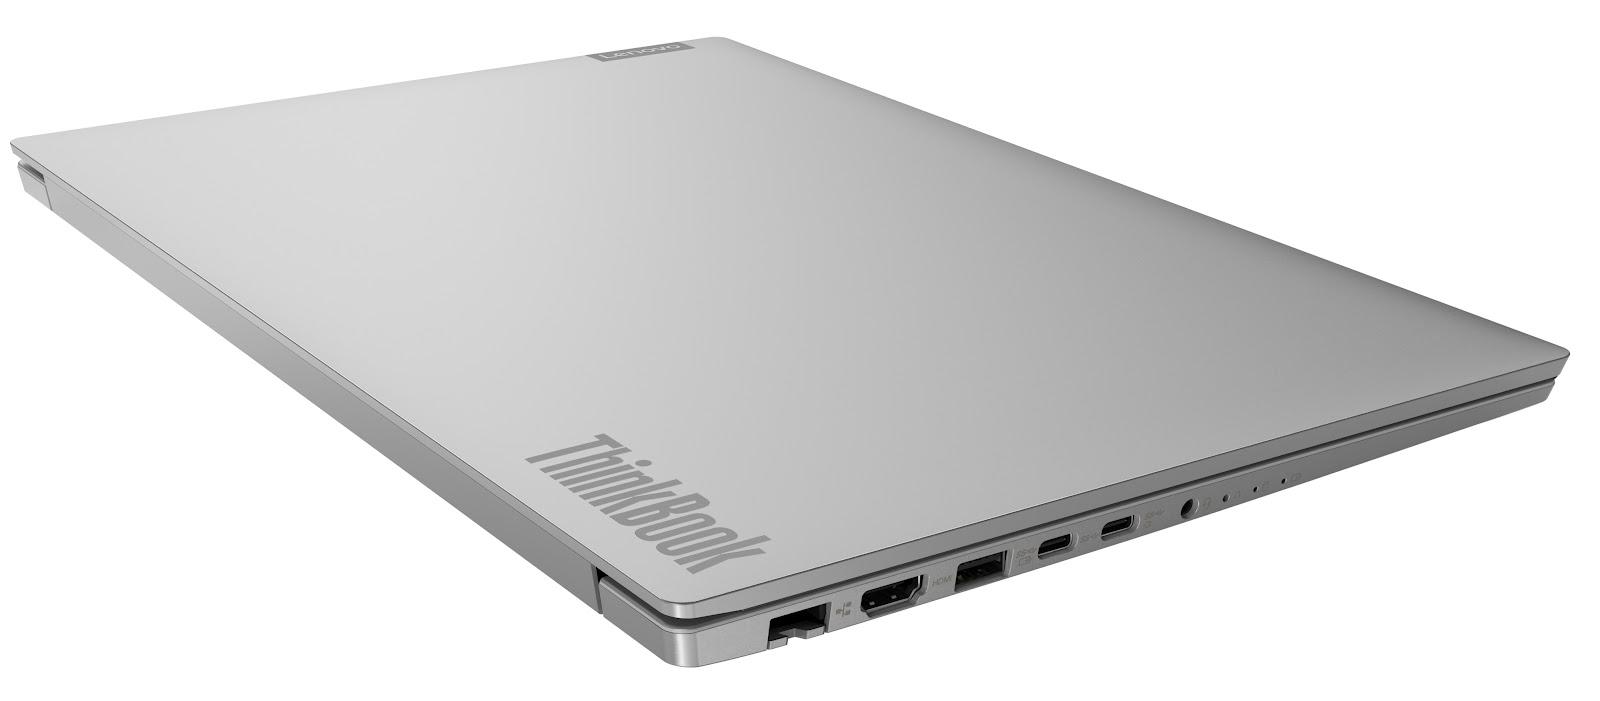 Фото 3. Ноутбук Lenovo ThinkBook 15-IIL (20SM003WRU)